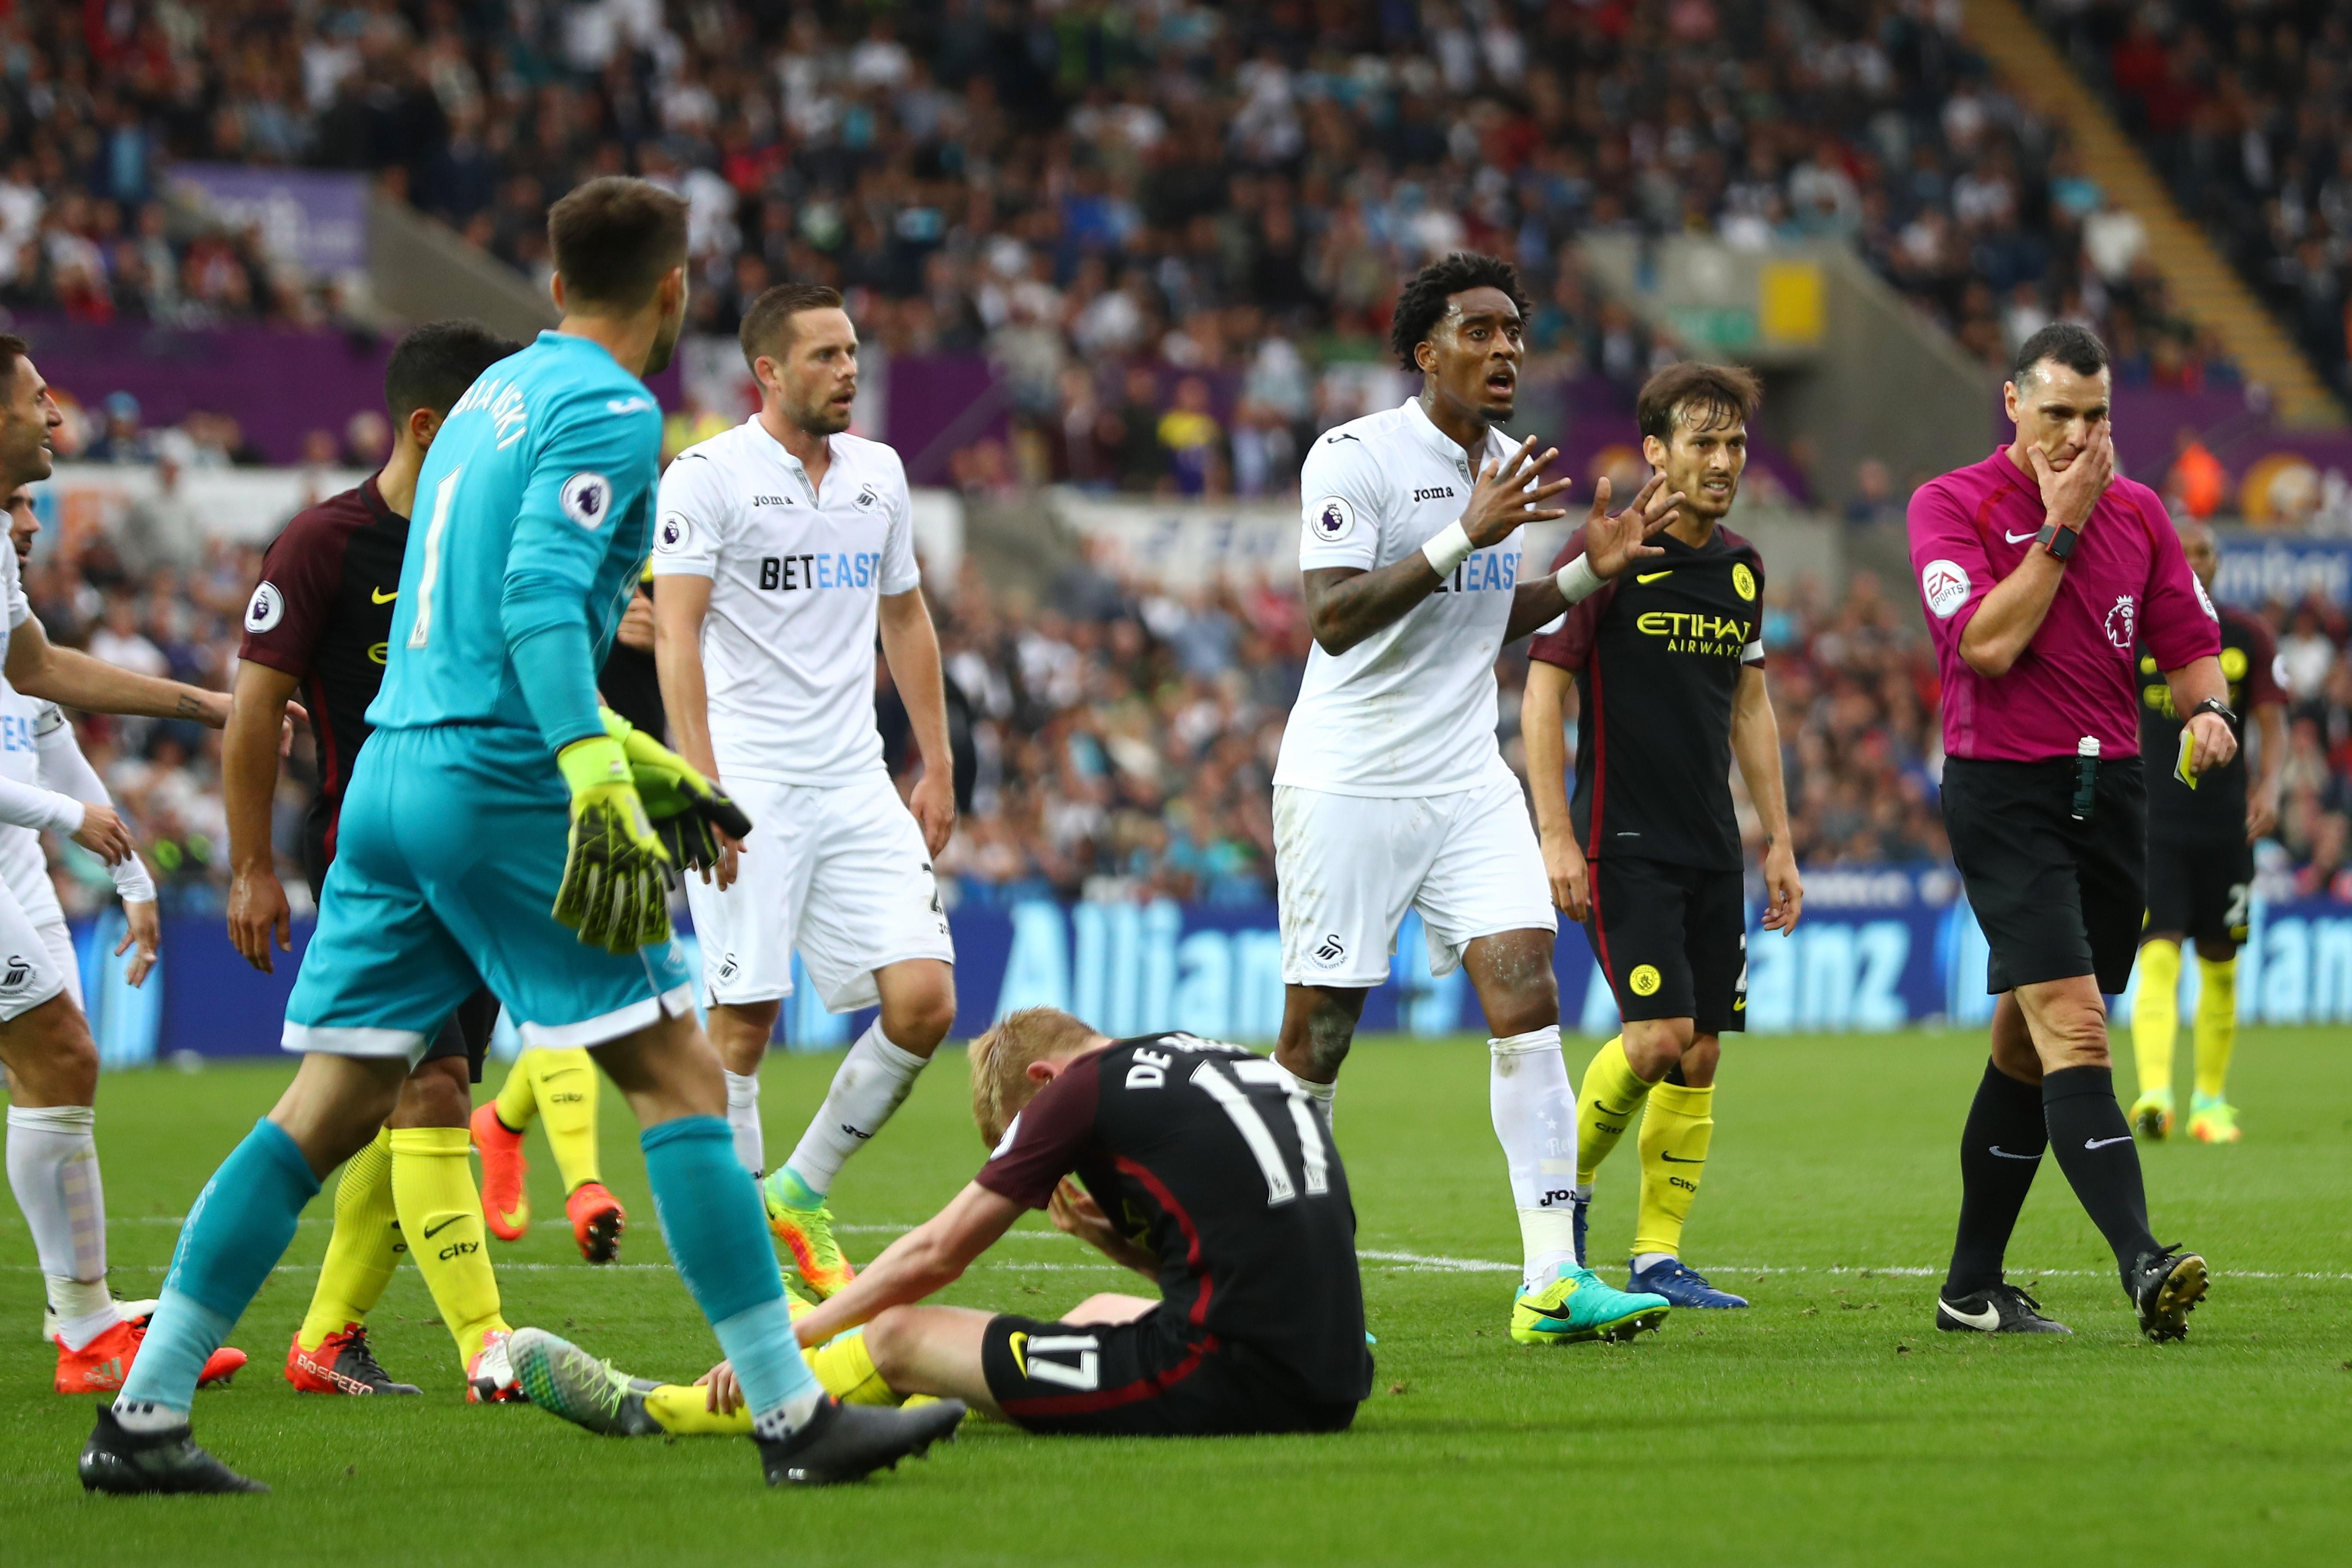 Manchester City Injury Update: De Bruyne, Kompany & Delph